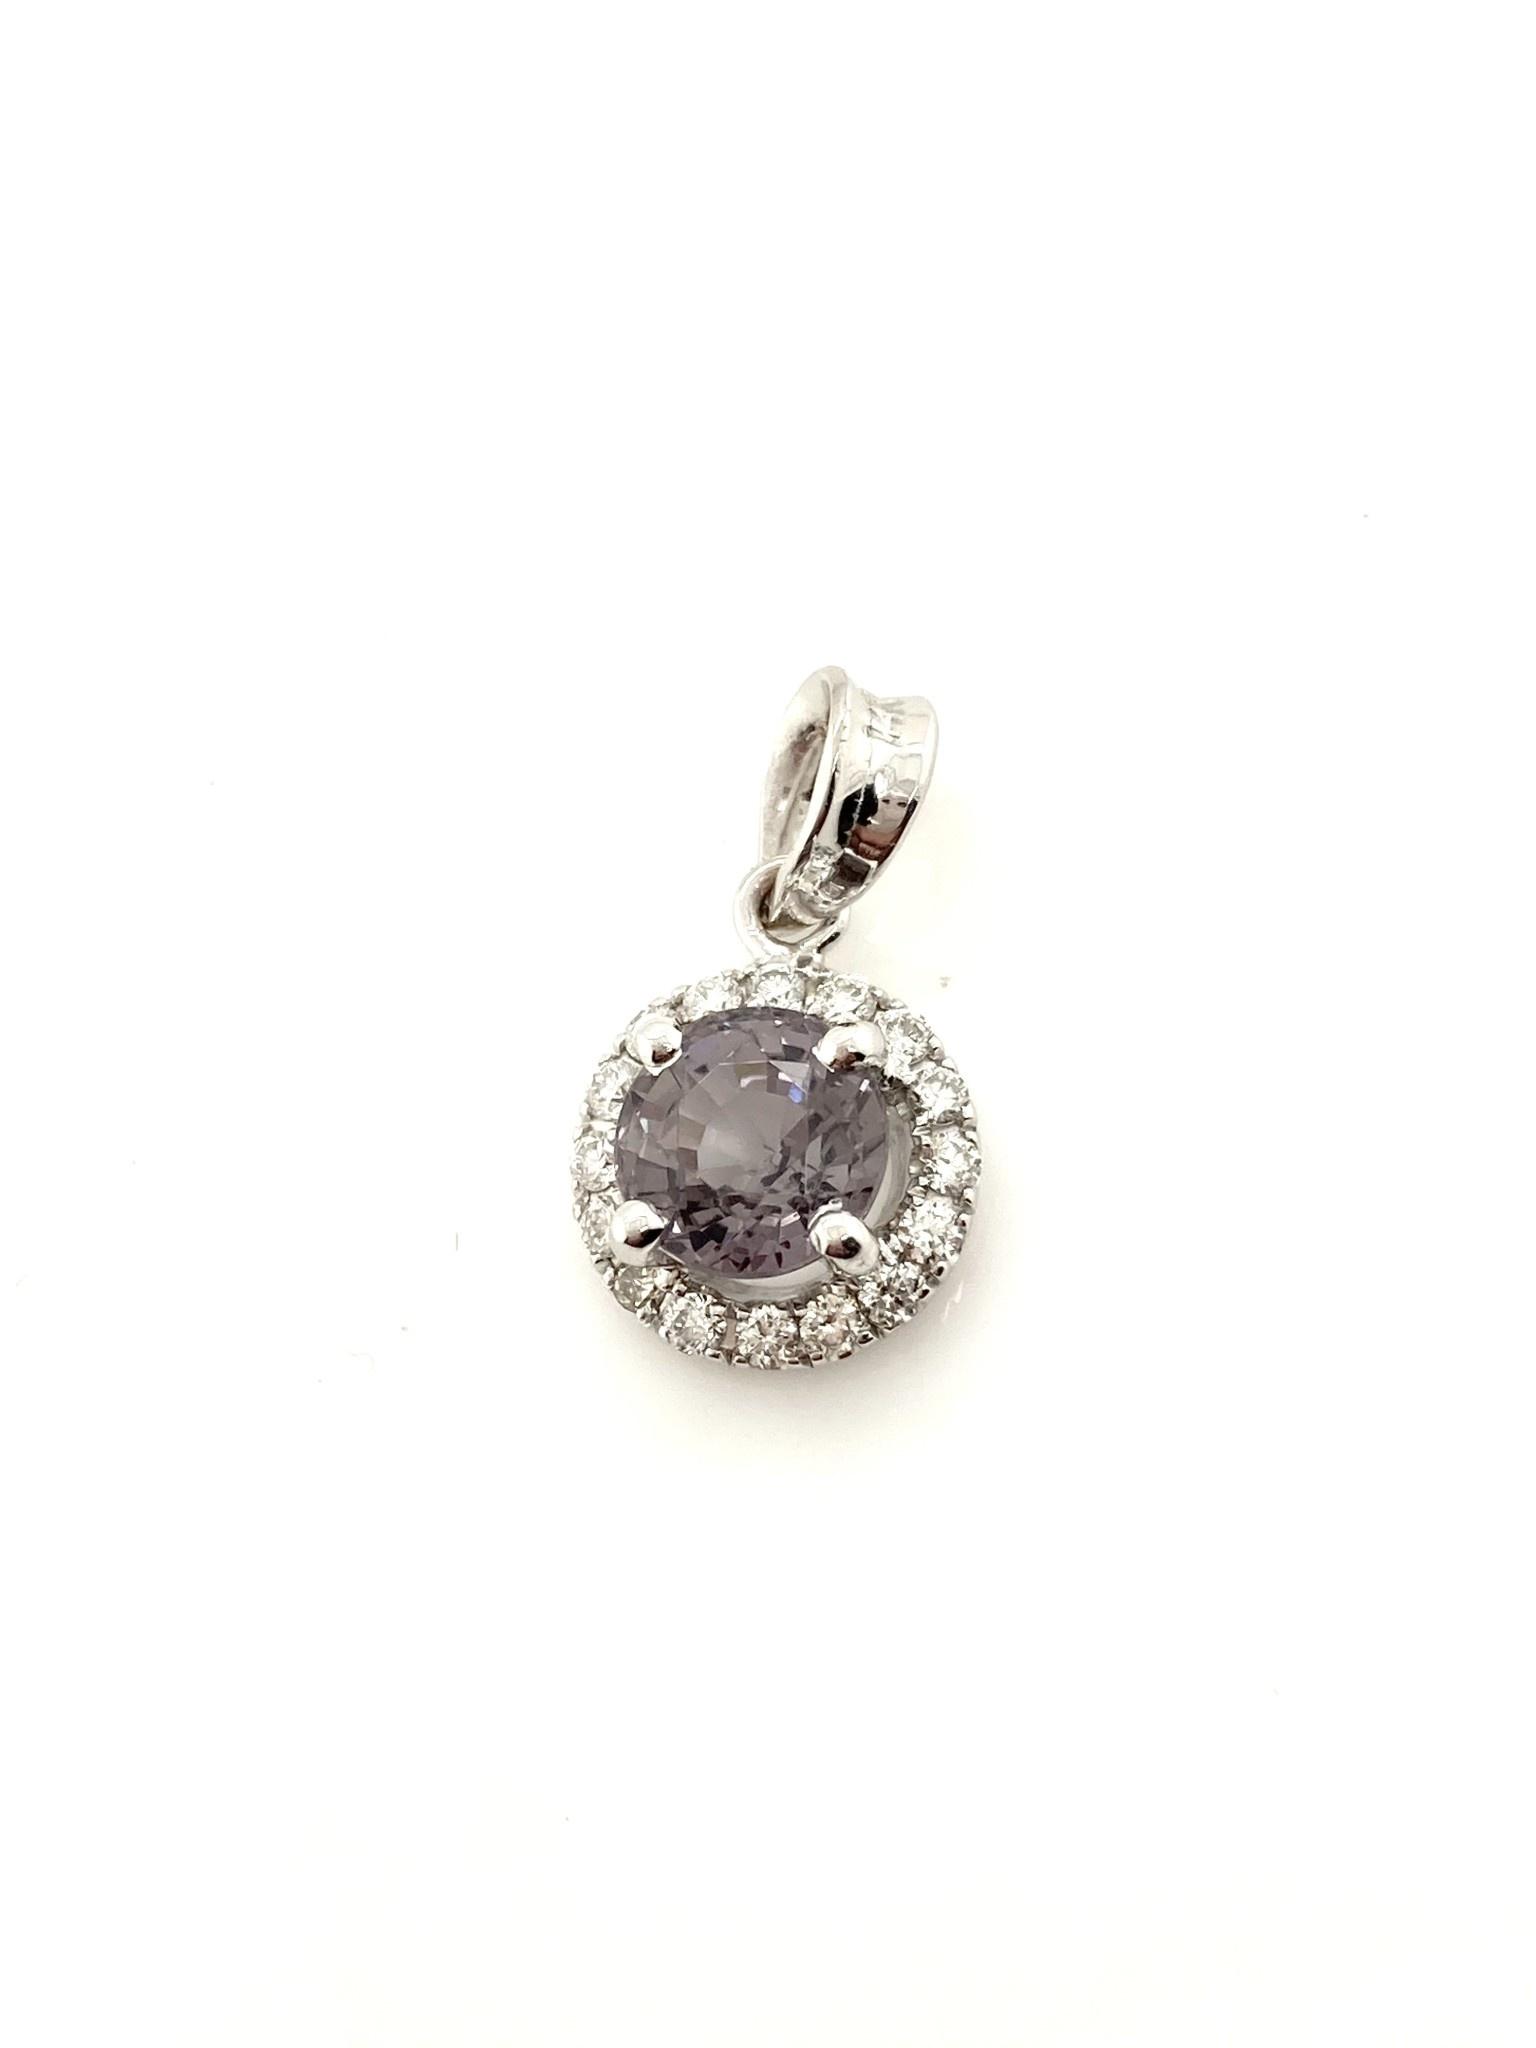 14K White Gold Lilac Burma Spinel with Diamond Halo Pendant